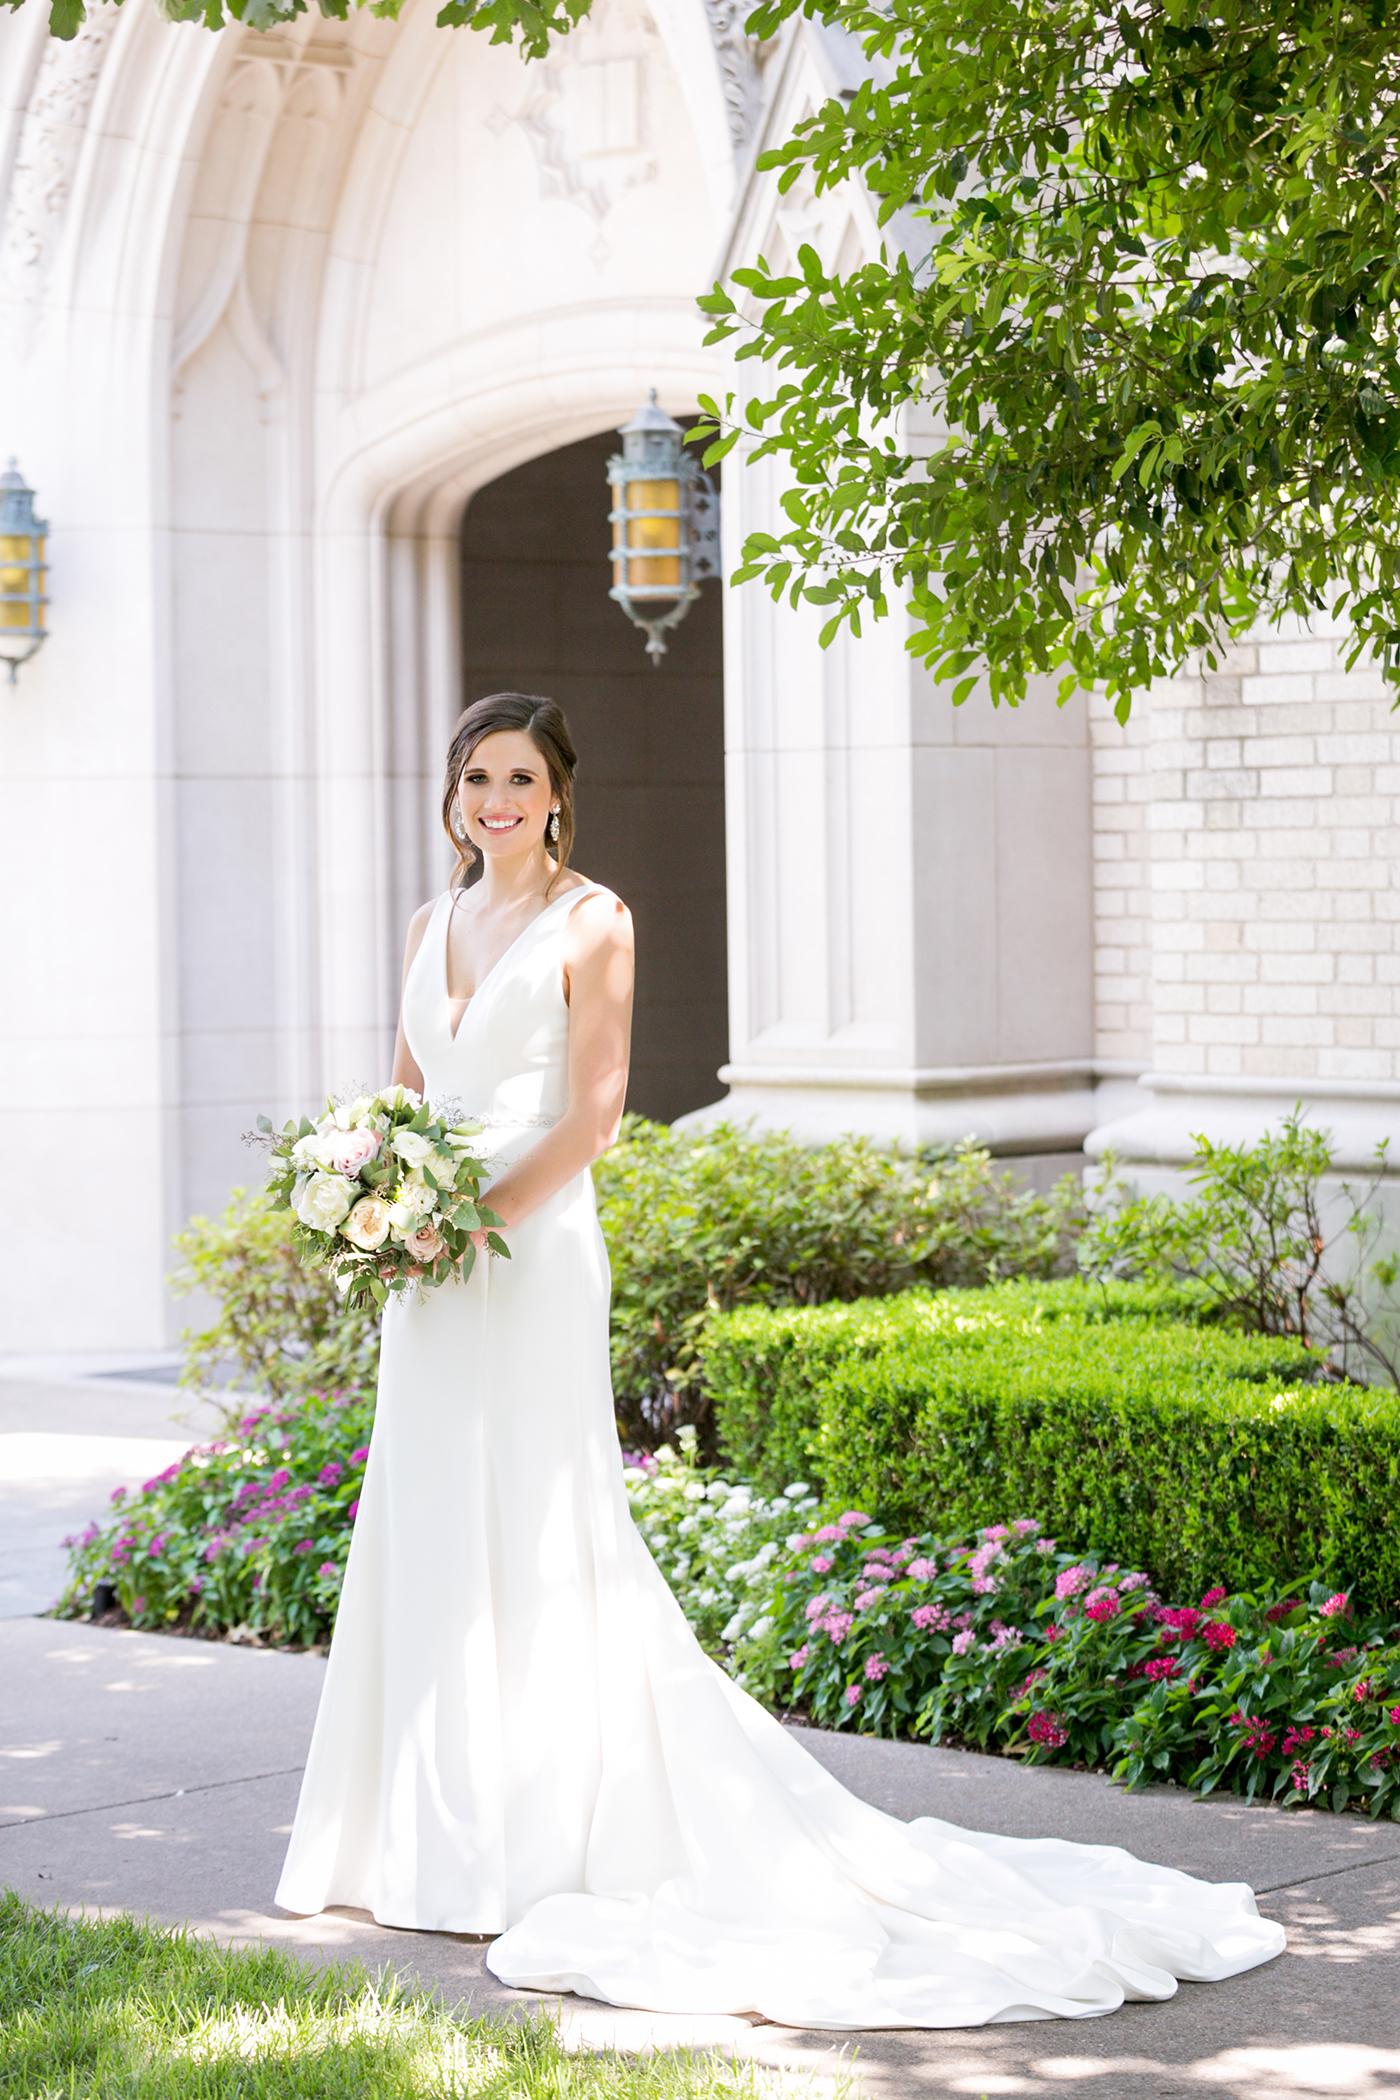 Wedding Planner Dallas TX - Allday Events - Highland Park - Marie Gabrielle Wedding - 191.jpg